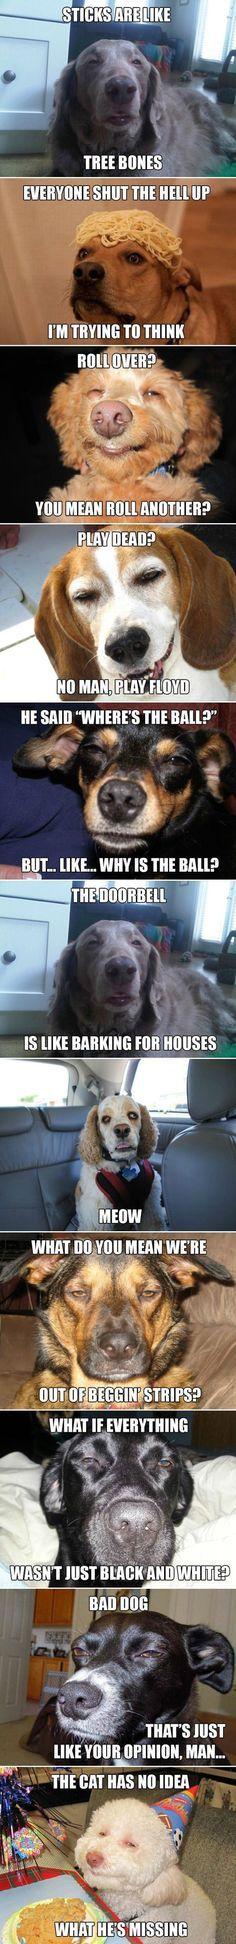 happy dogs, funny dog memes, canines dat look super high on da kine http://www.zipgrinders.com/?utm_source=pinterest&utm_medium=pin&utm_campaign=marijuana%20memes